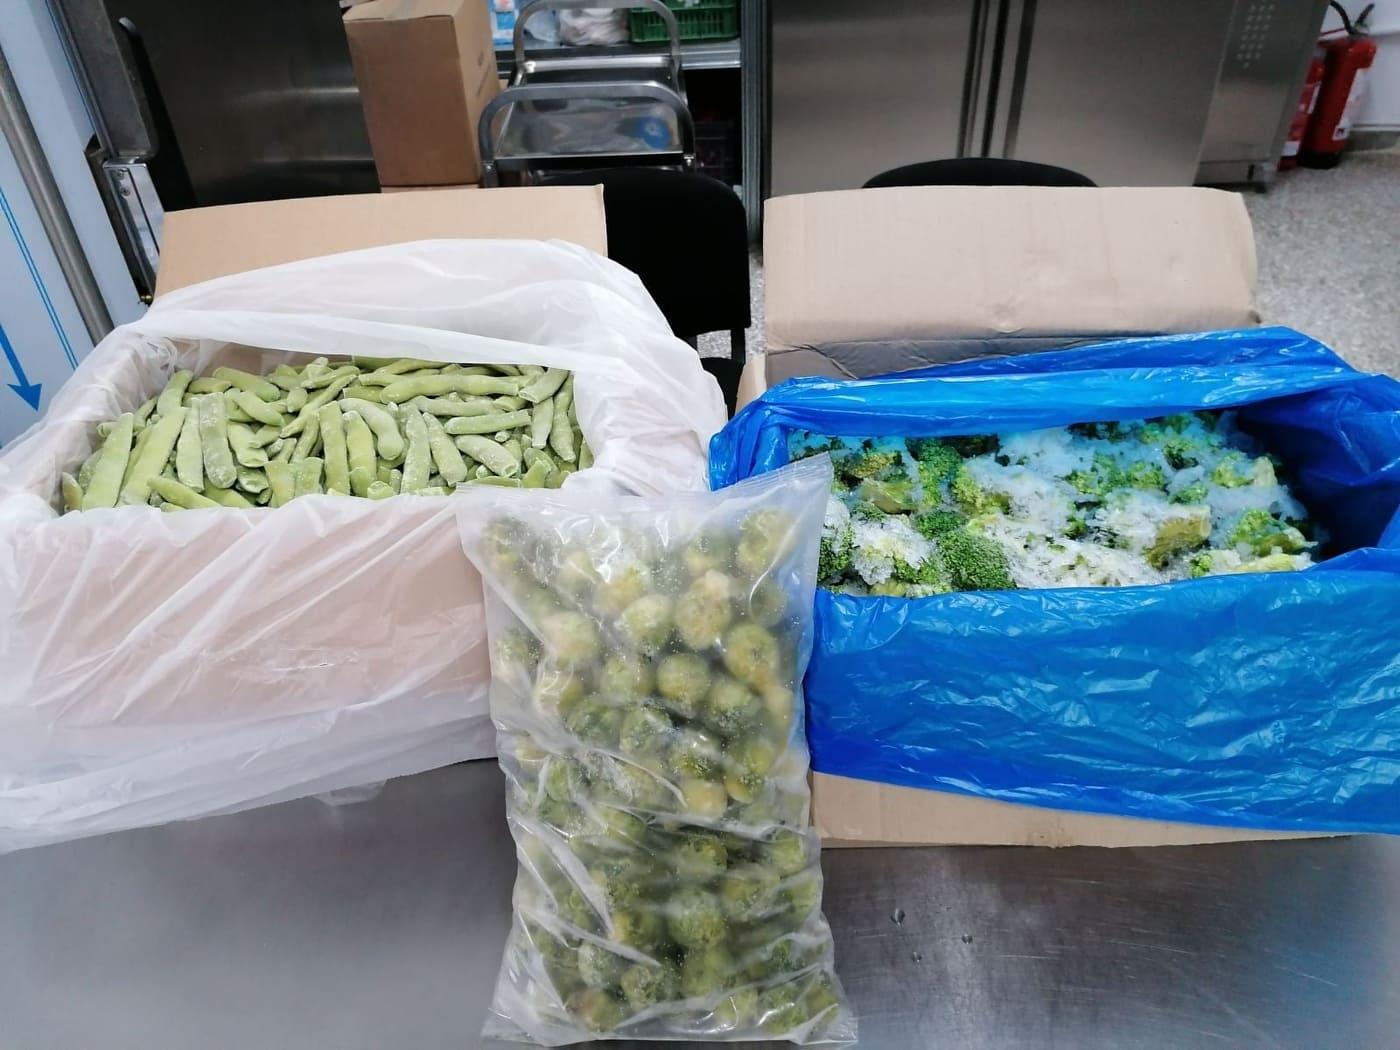 100 kg κατεψυγμένα τρόφιμα από την  «ΥΦΑΝΤΗΣ» στο Κοινωνικό Παντοπωλείο του Δήμου Πωγωνίου